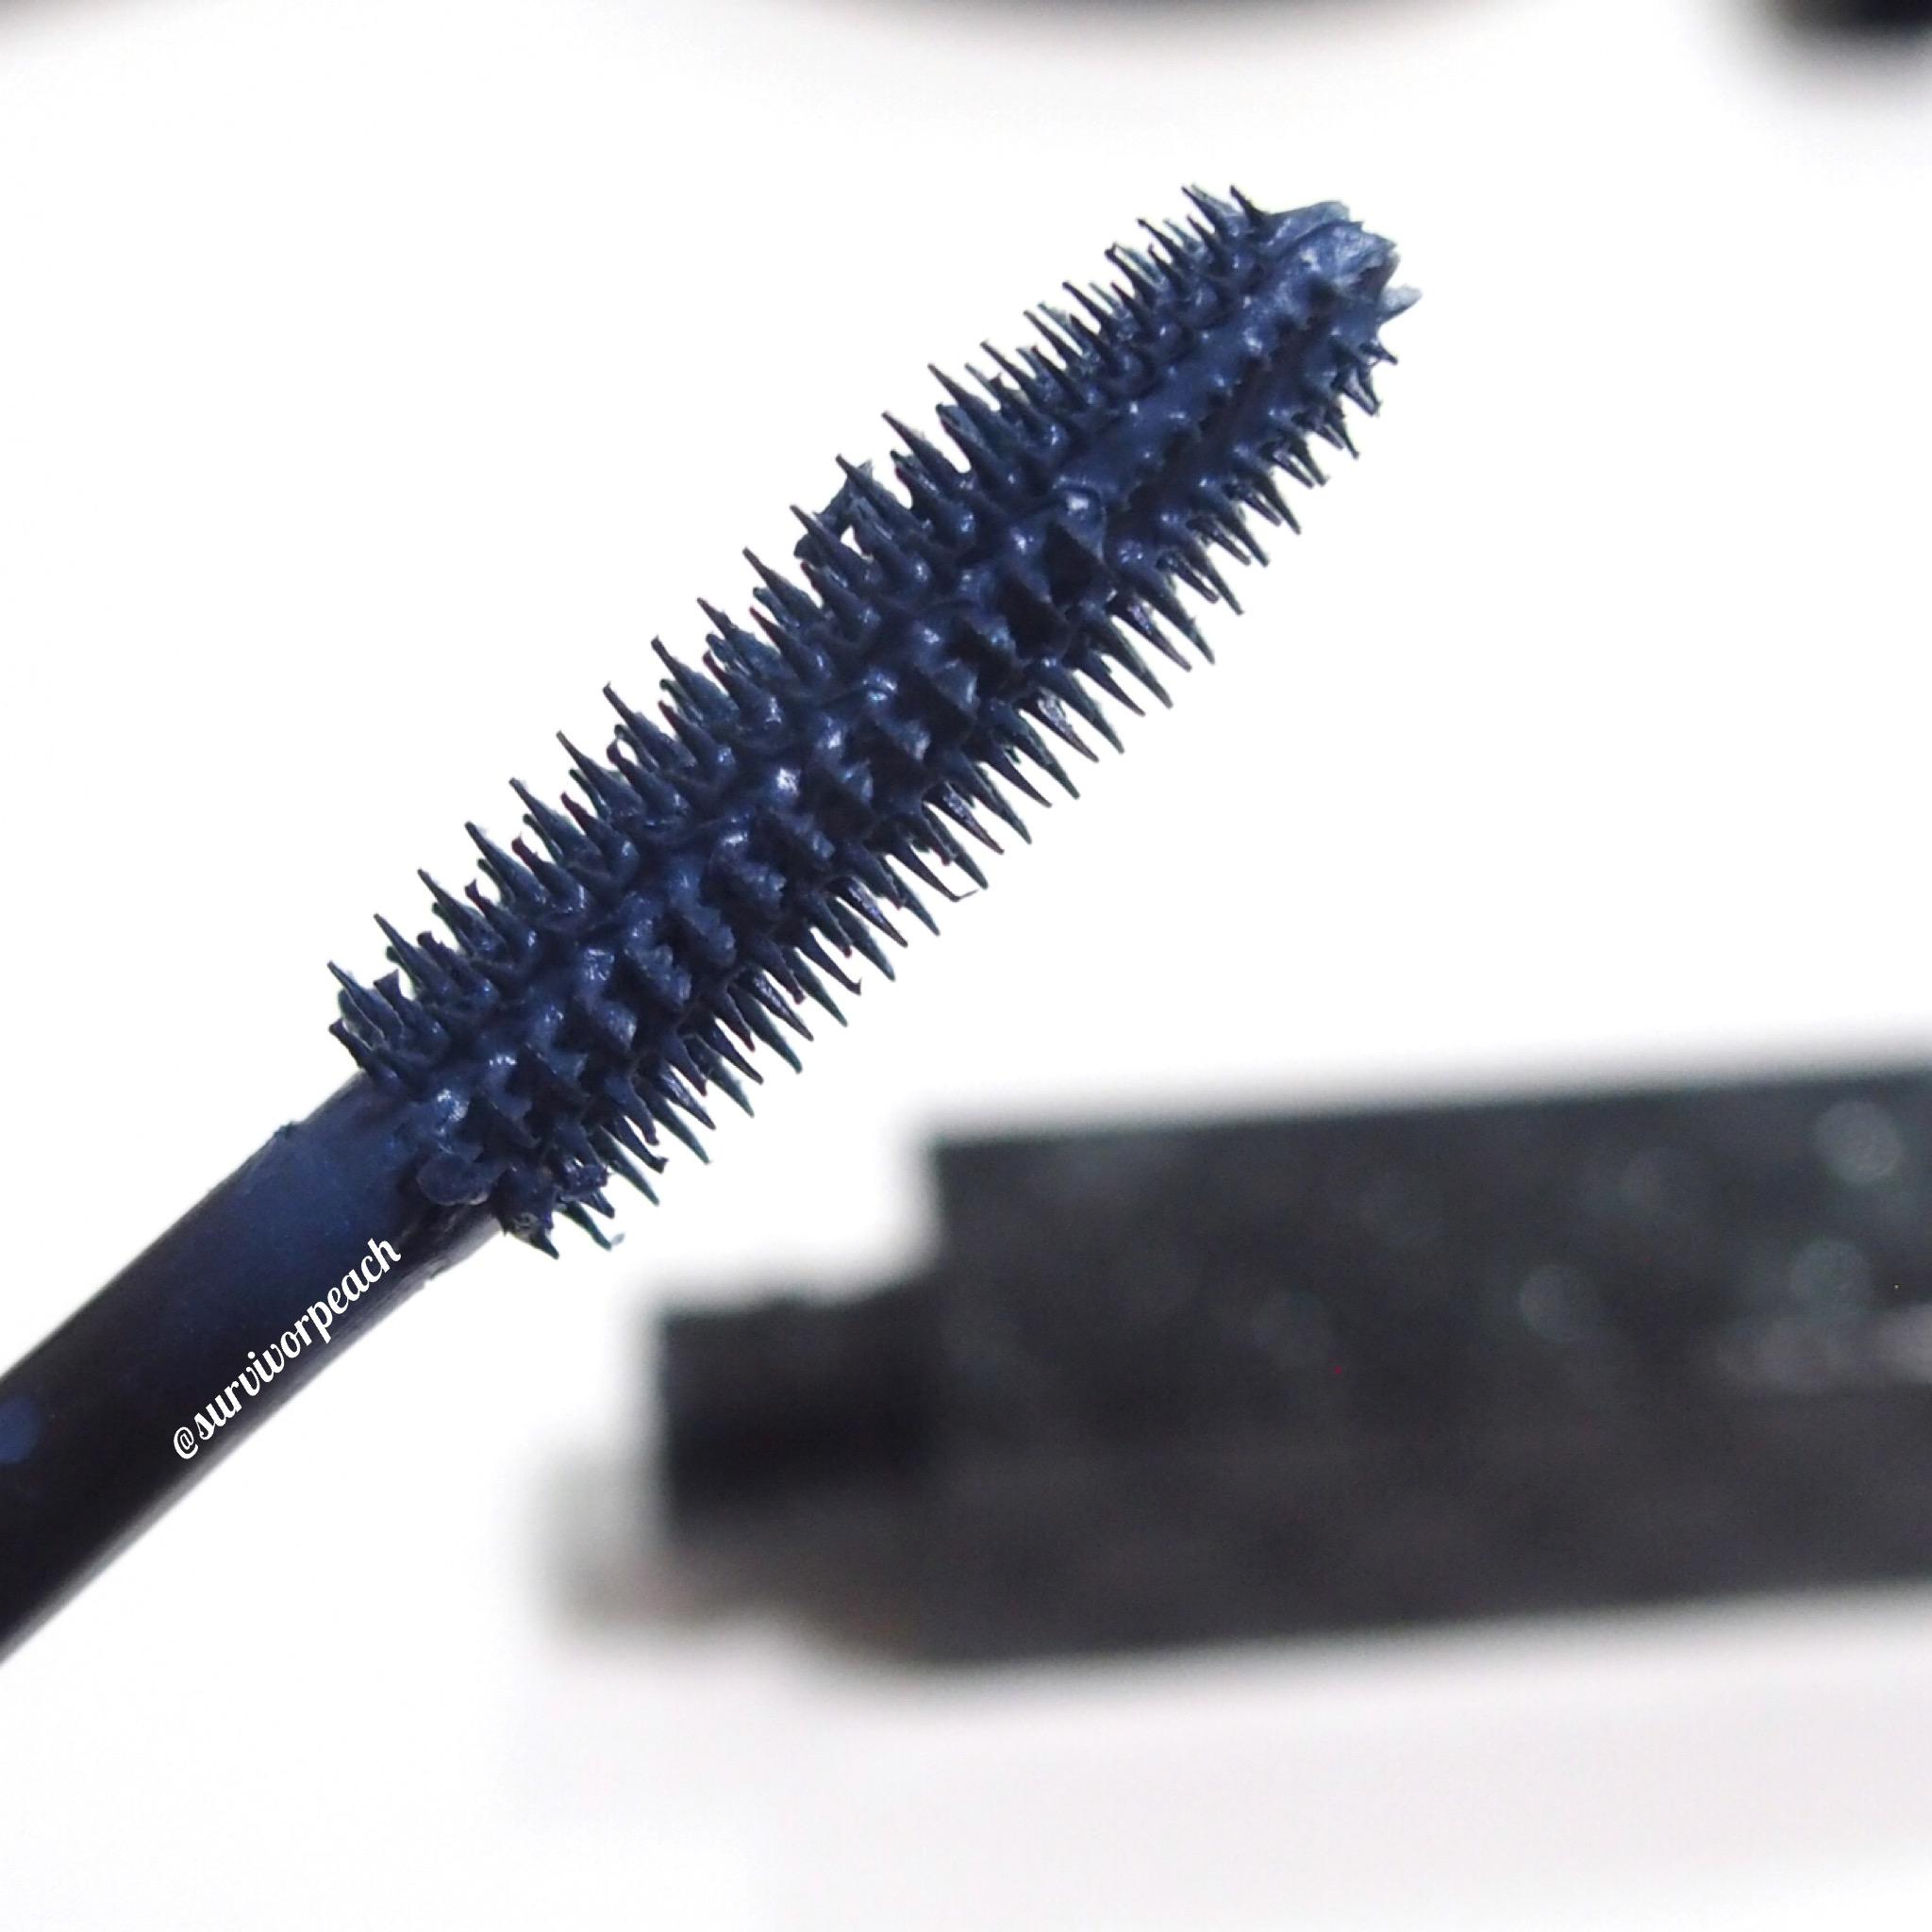 Opulent Volume Mascara in shade Midnight Blue